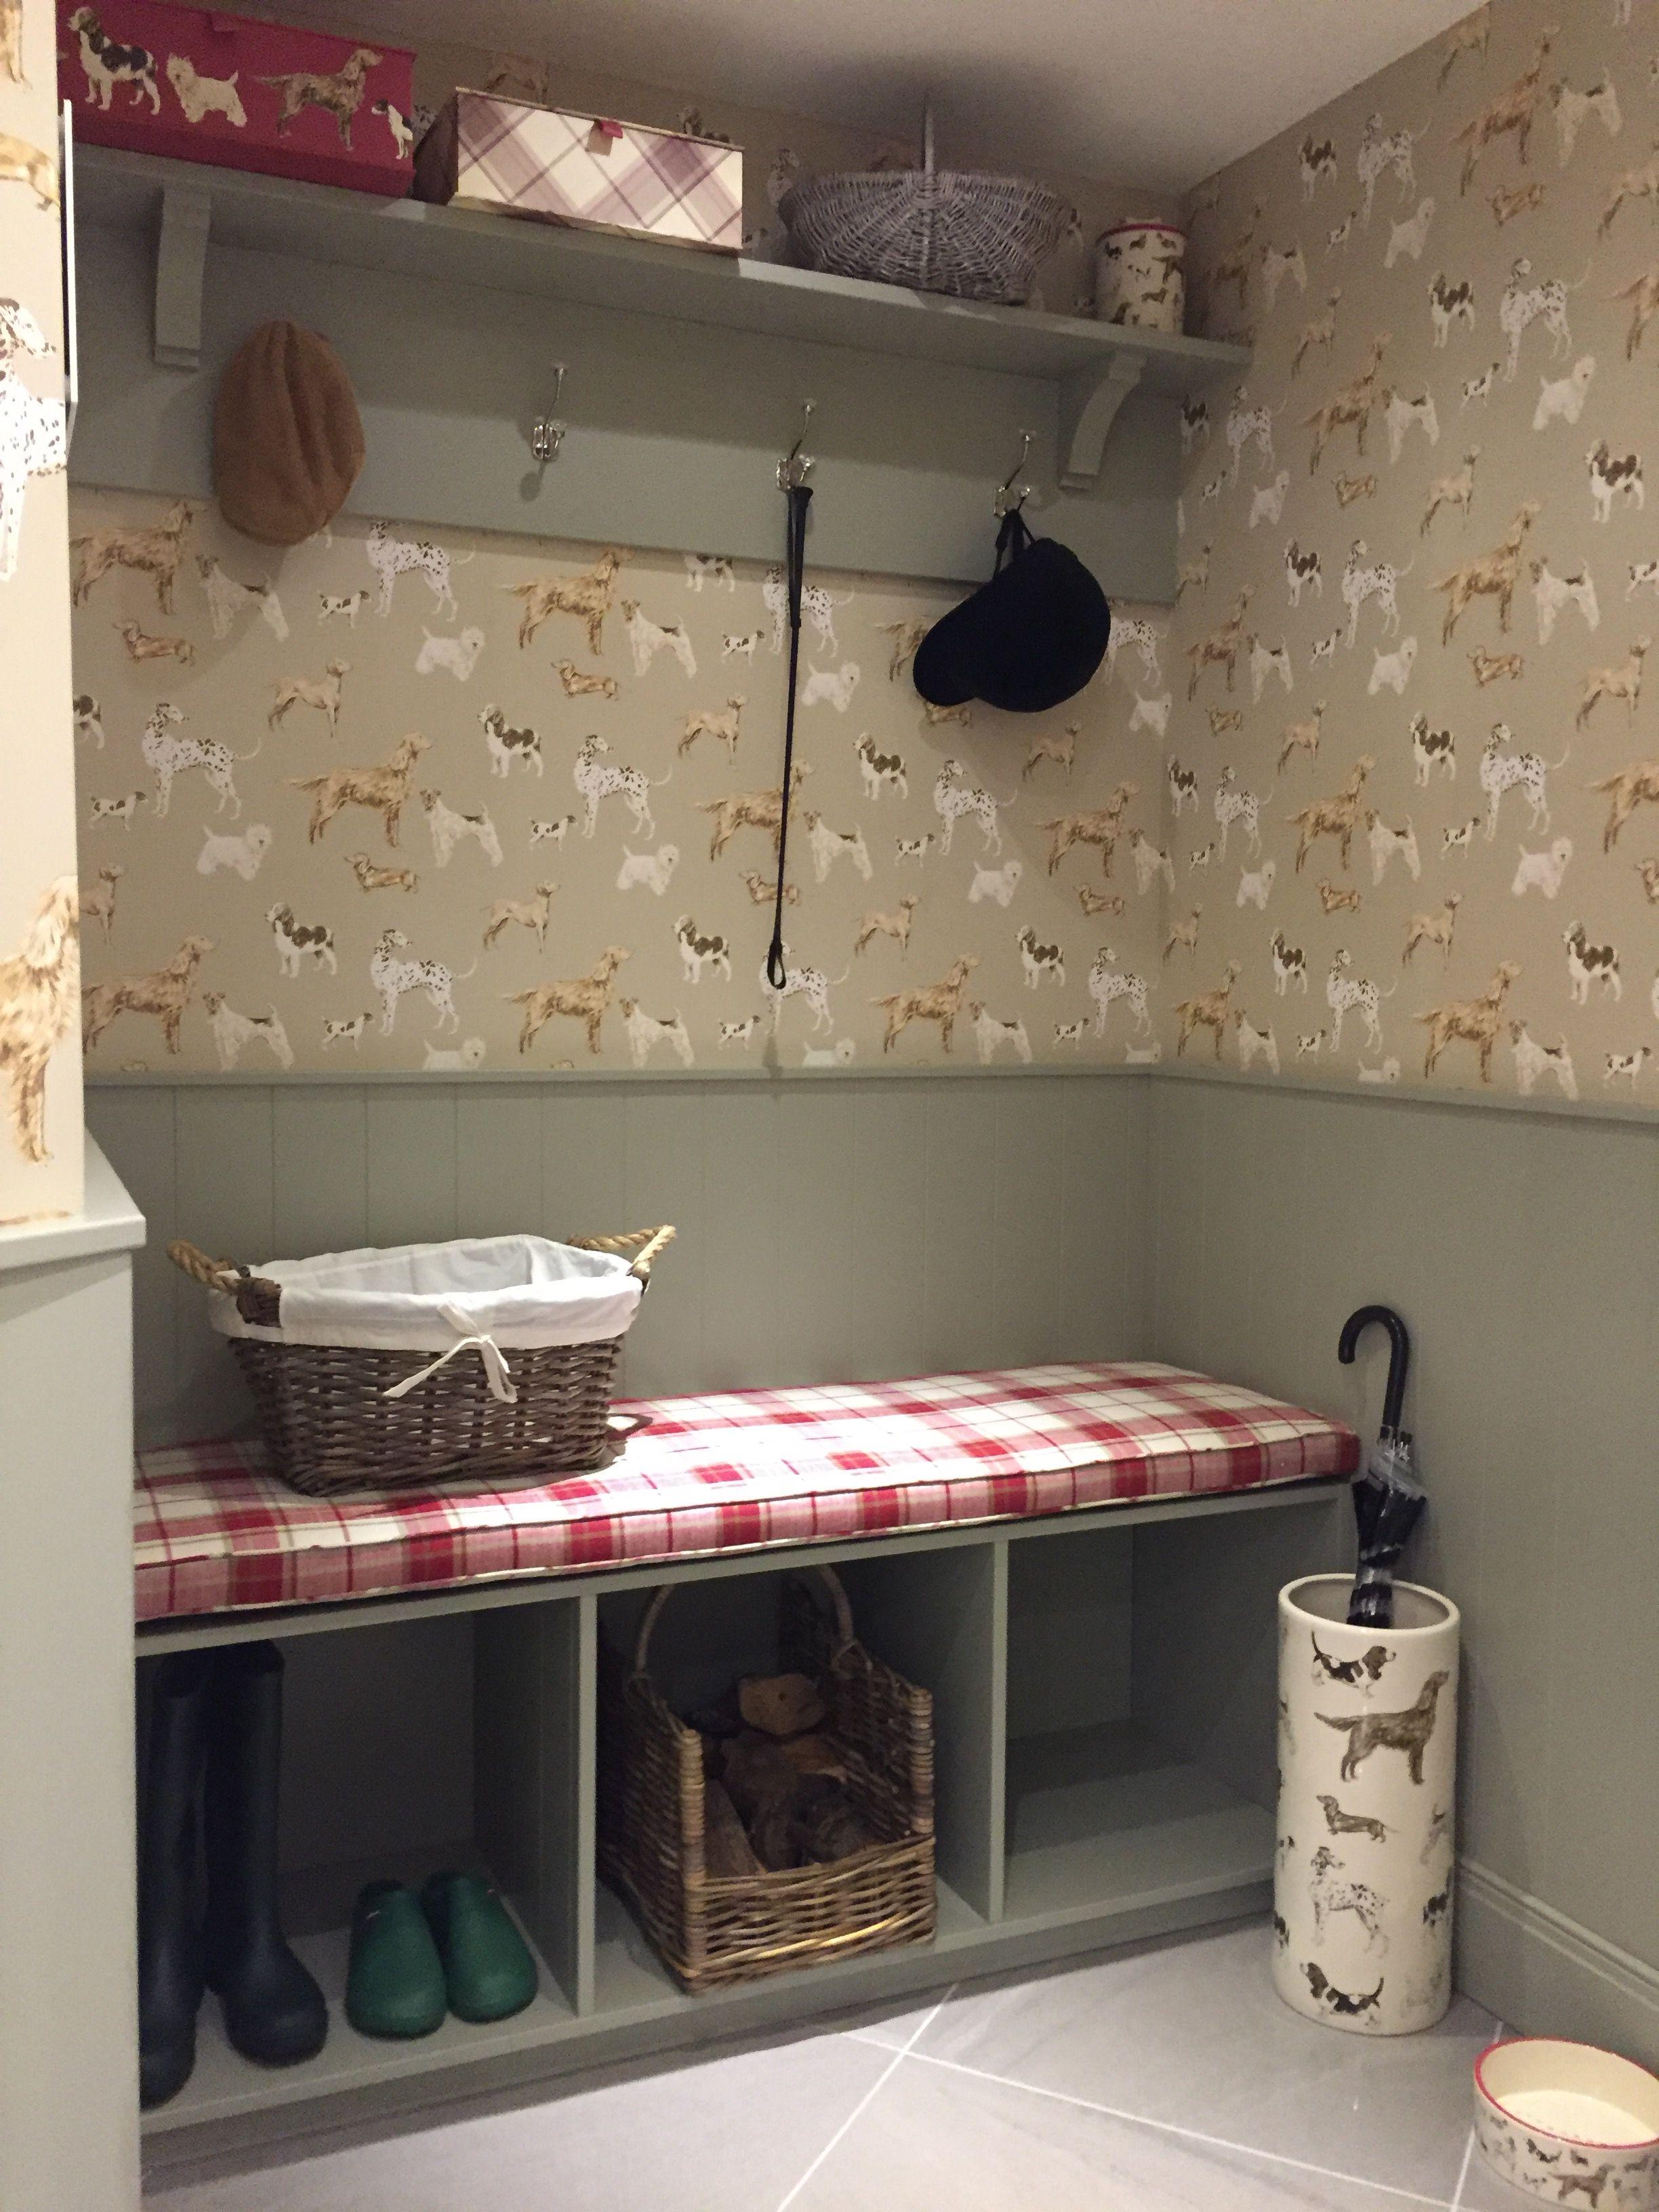 Laura Ashely Harwood Boot Room With Ashley Hunterhill Dog Dark Linen Patterned Wallpaper